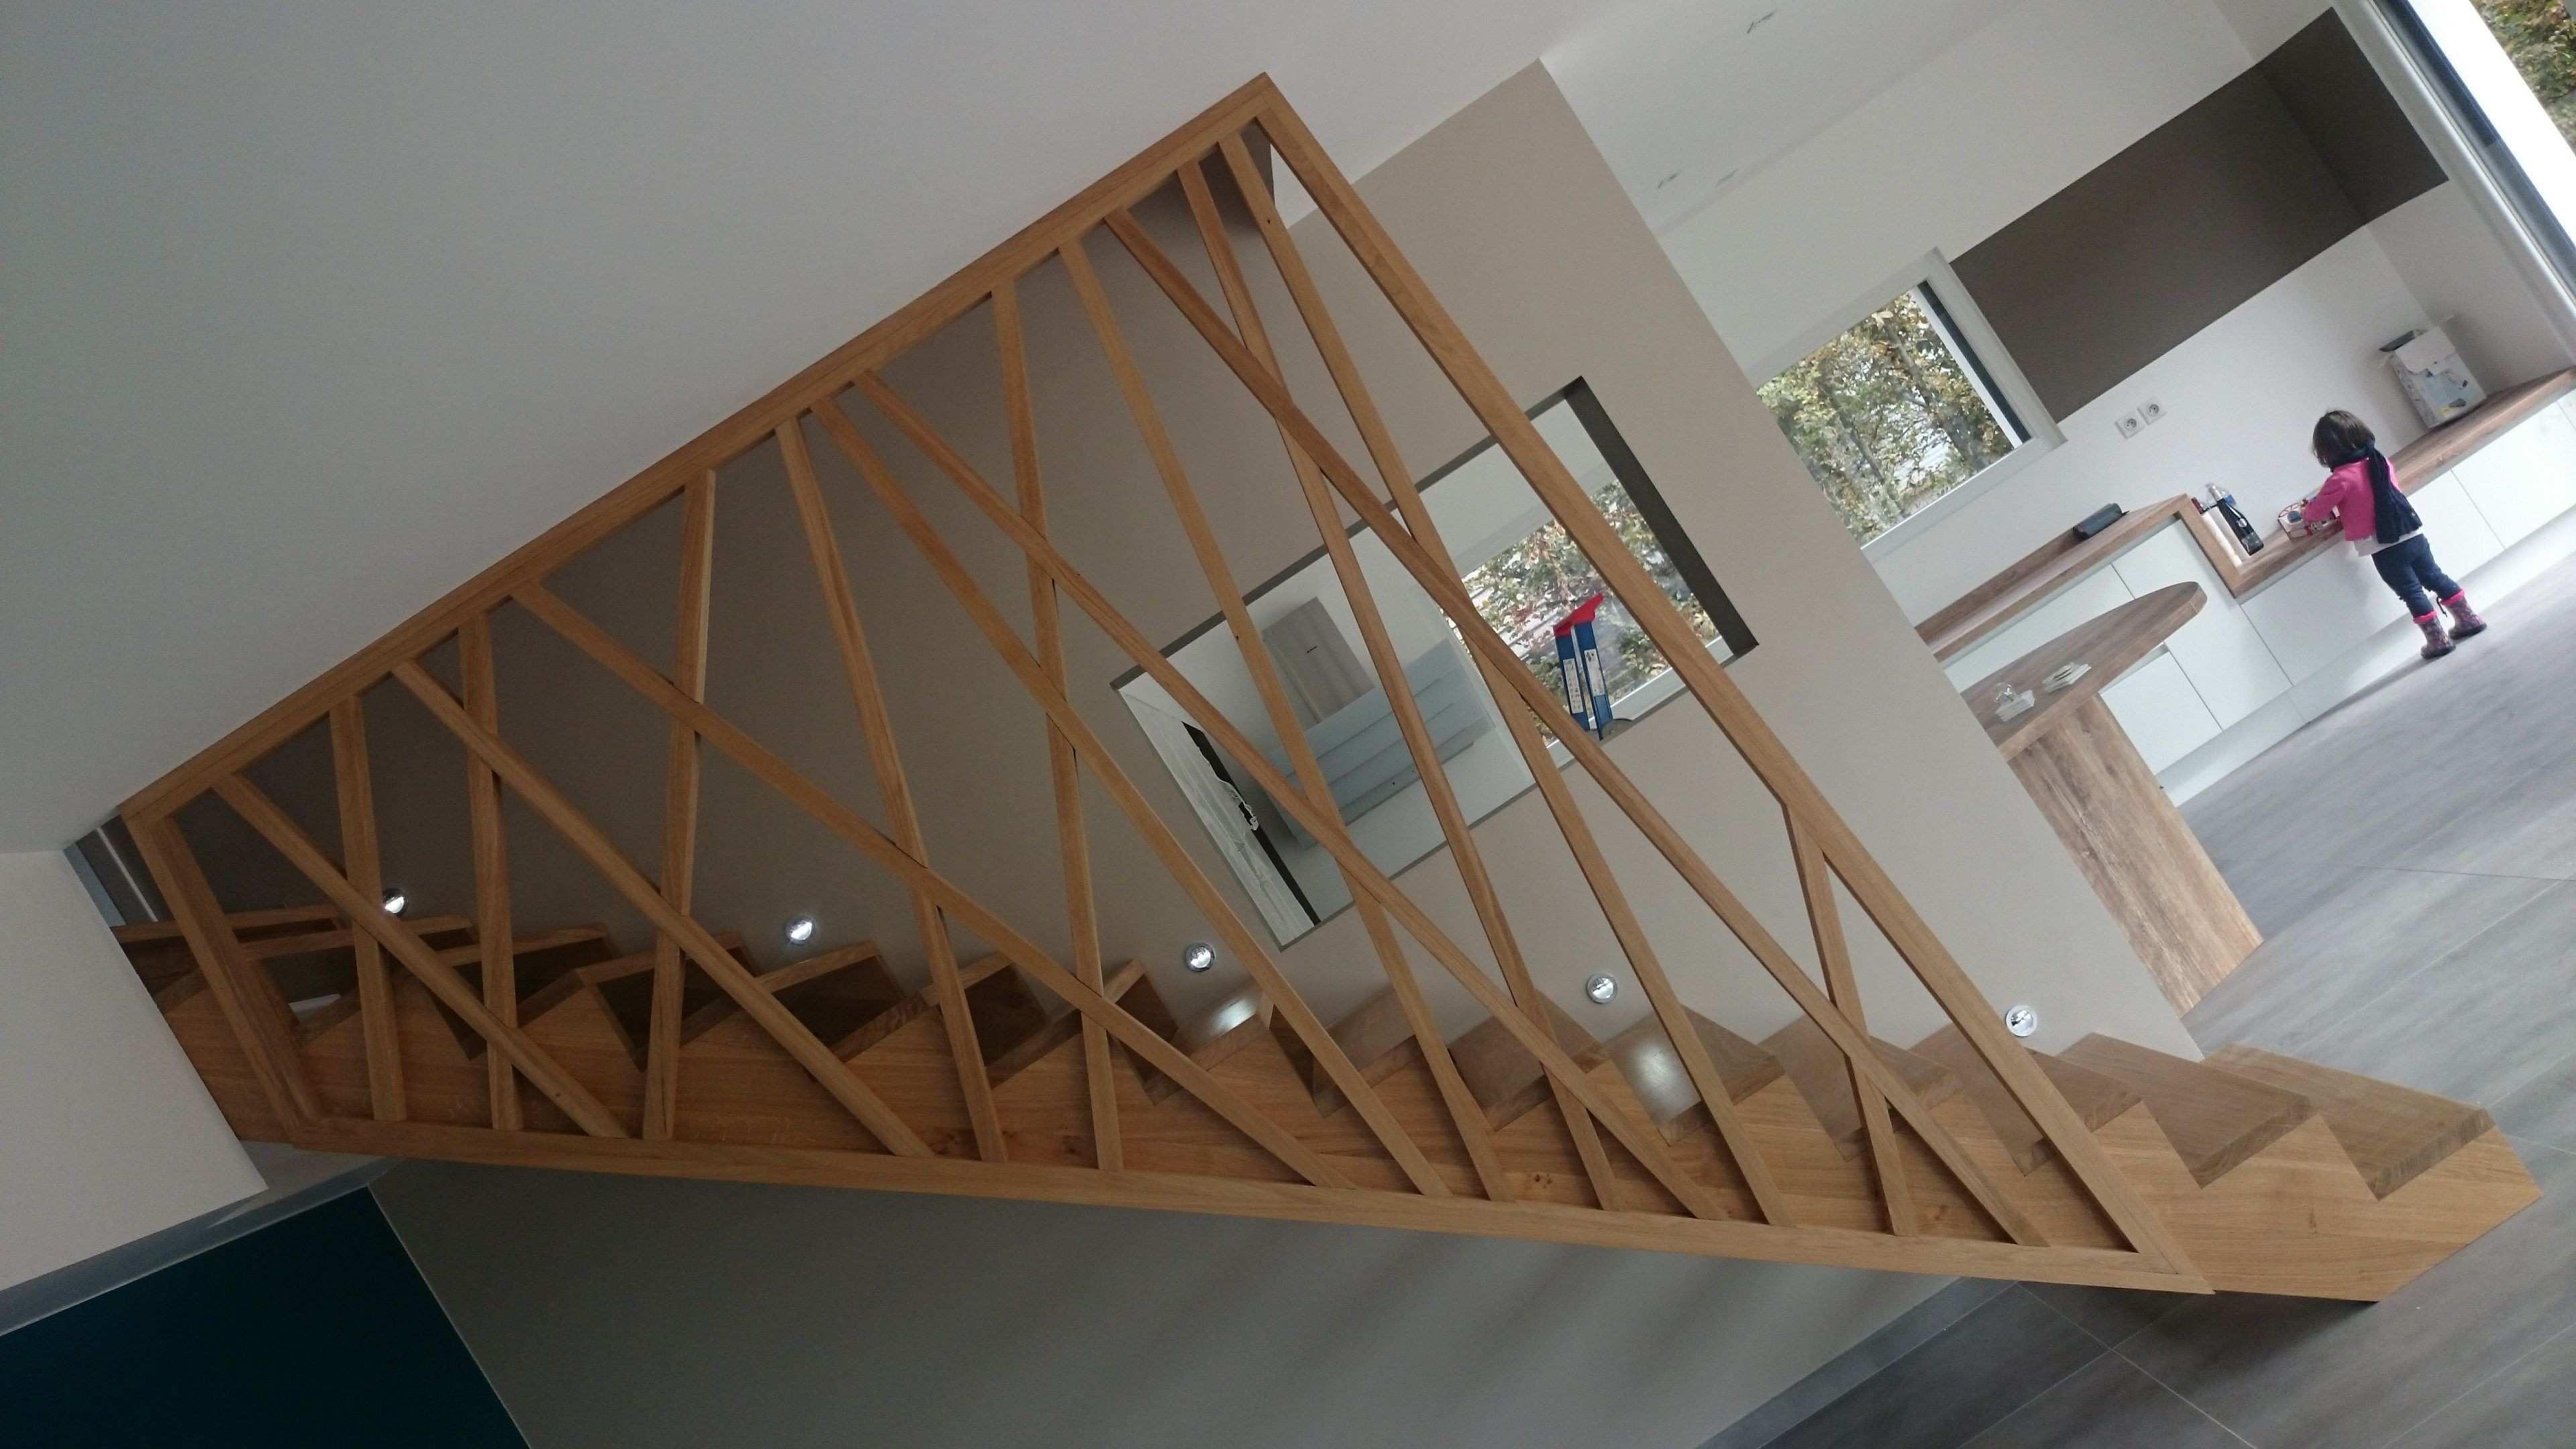 Fabriquer Un Claustra Bois 24 photo probable garde corps bois escalier interieur de